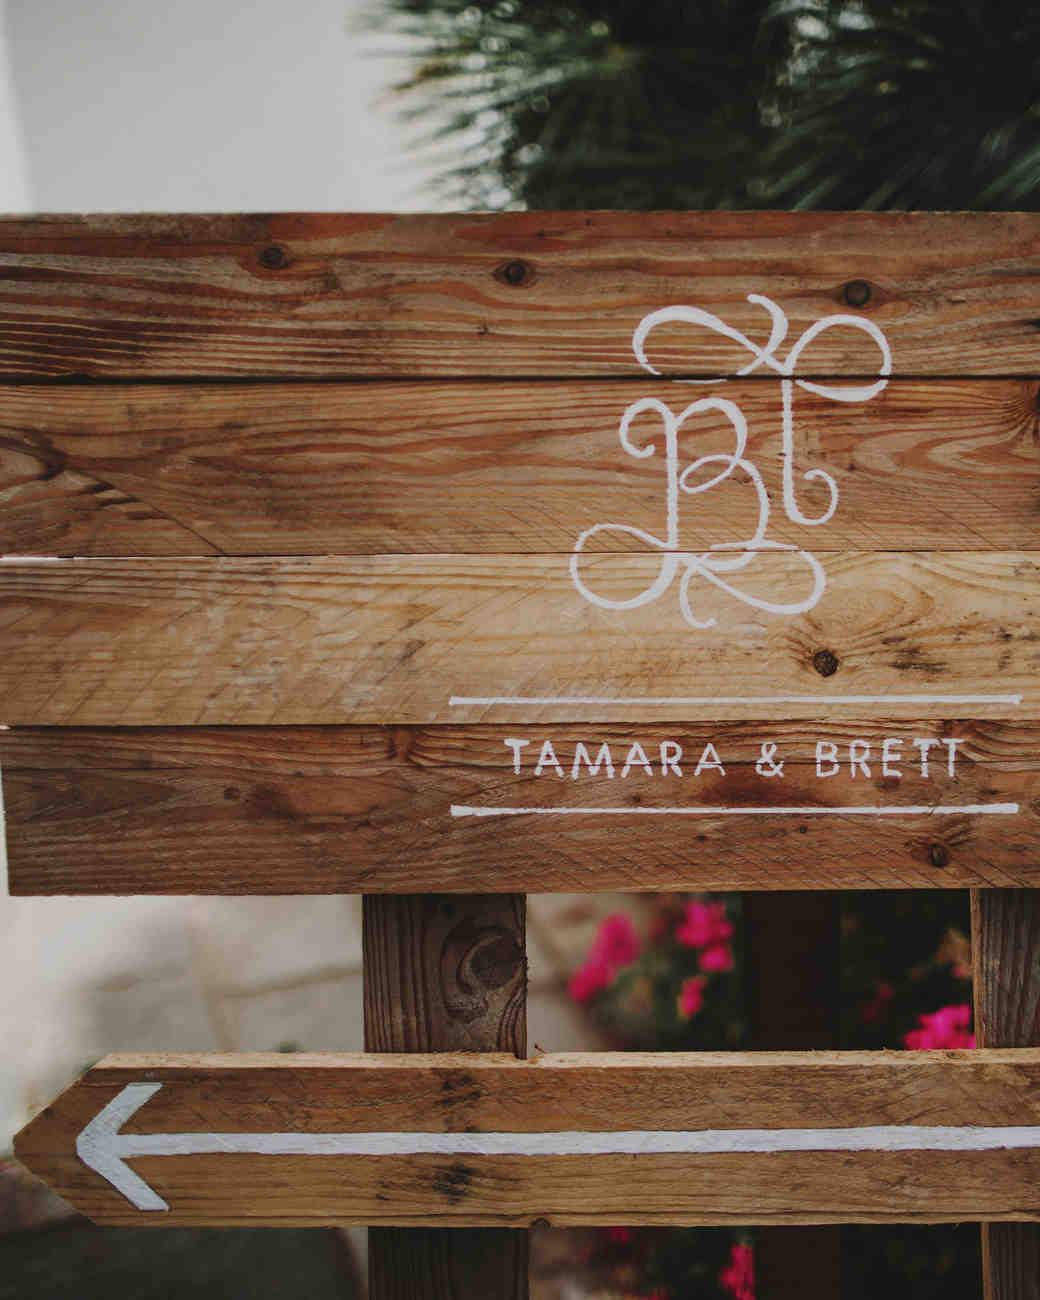 tamara-brett-wedding-signage-0165-s112120-0915.jpg